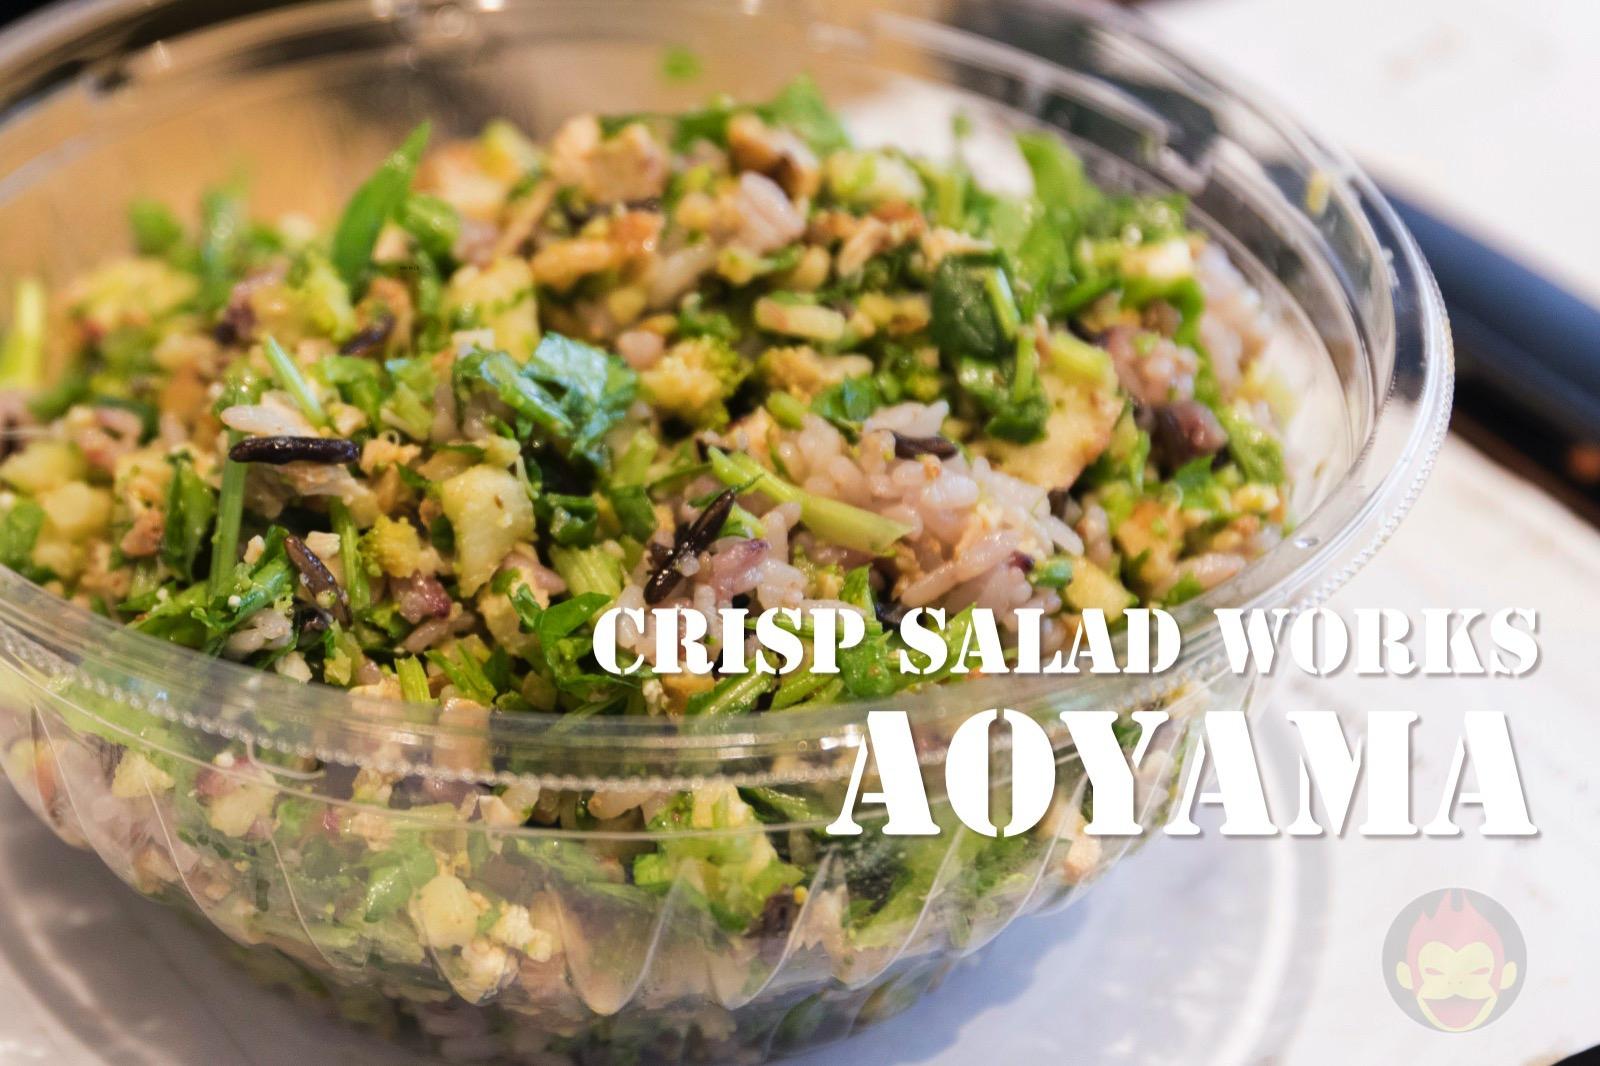 Crips Salad Works Aoyama